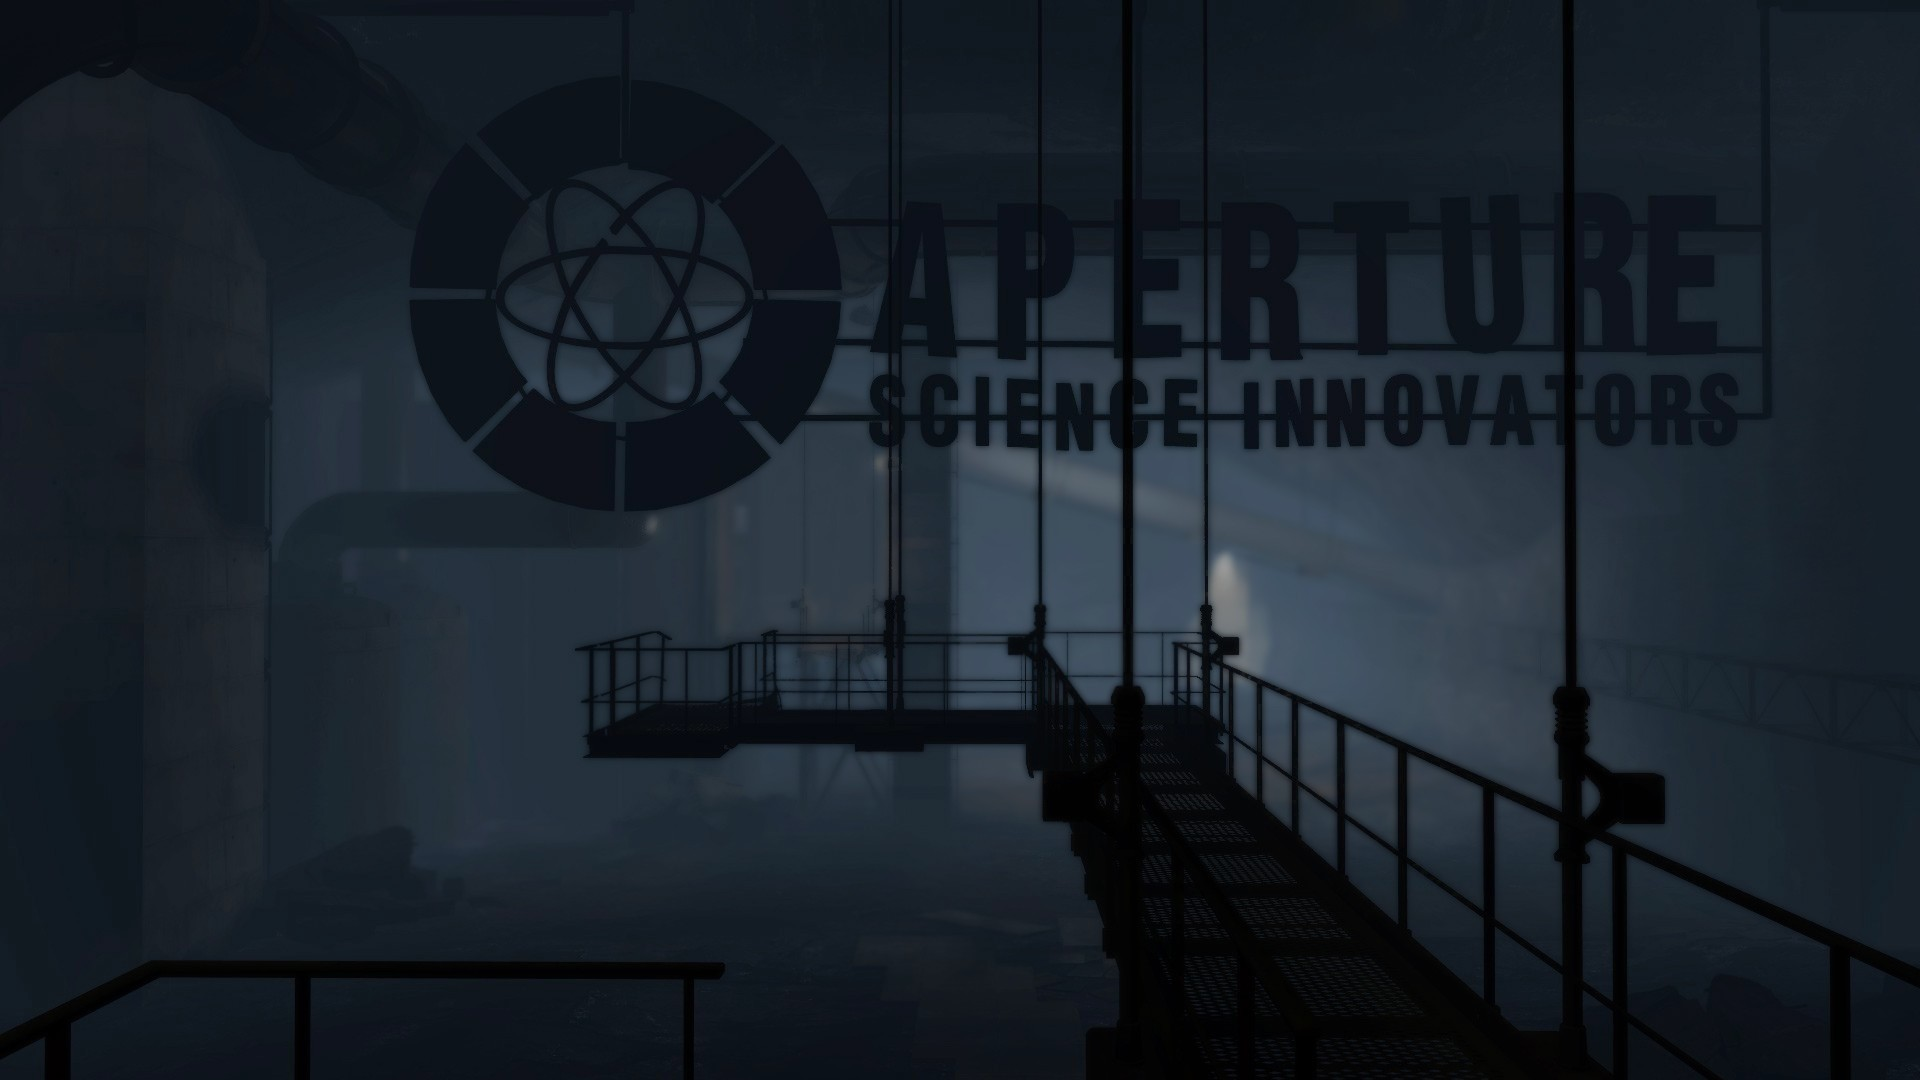 Portal 2: Aperture Science Innovators